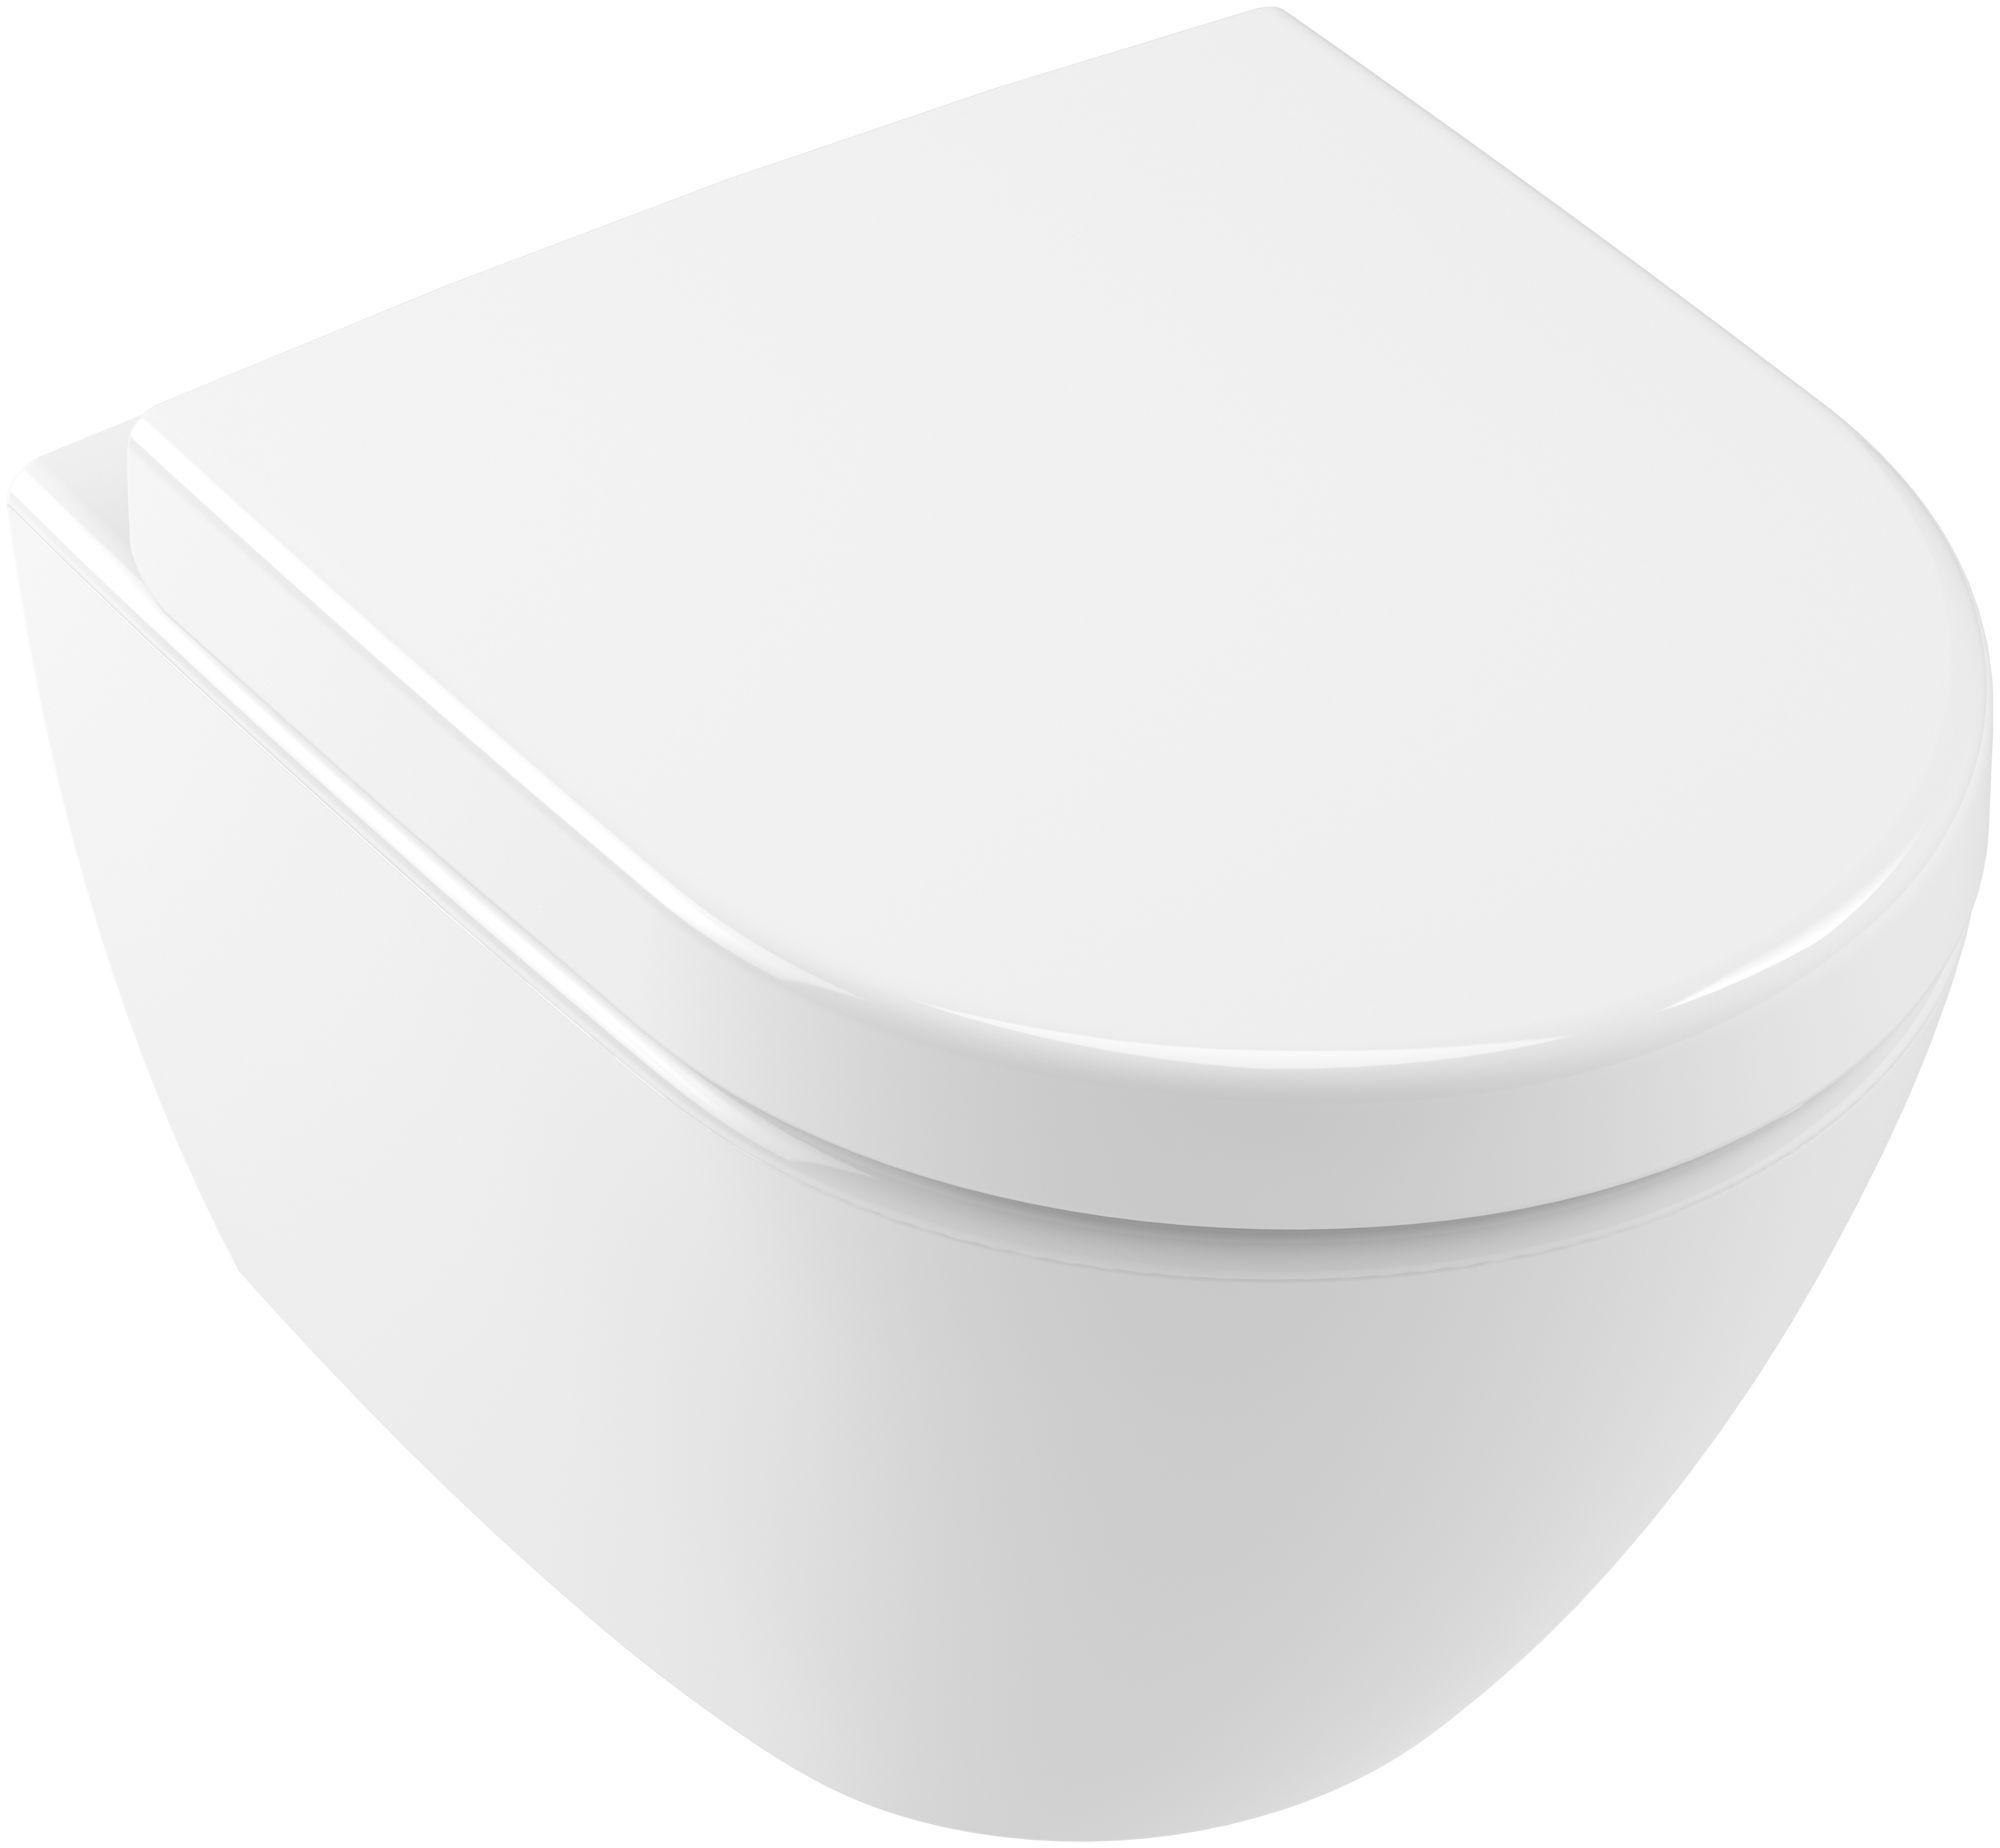 Villeroy & Boch Subway 2.0 Tiefspül-Wand-WC compact DirectFlush mit offenem Spülrand L:48xB:35,5cm weiß 5606R001